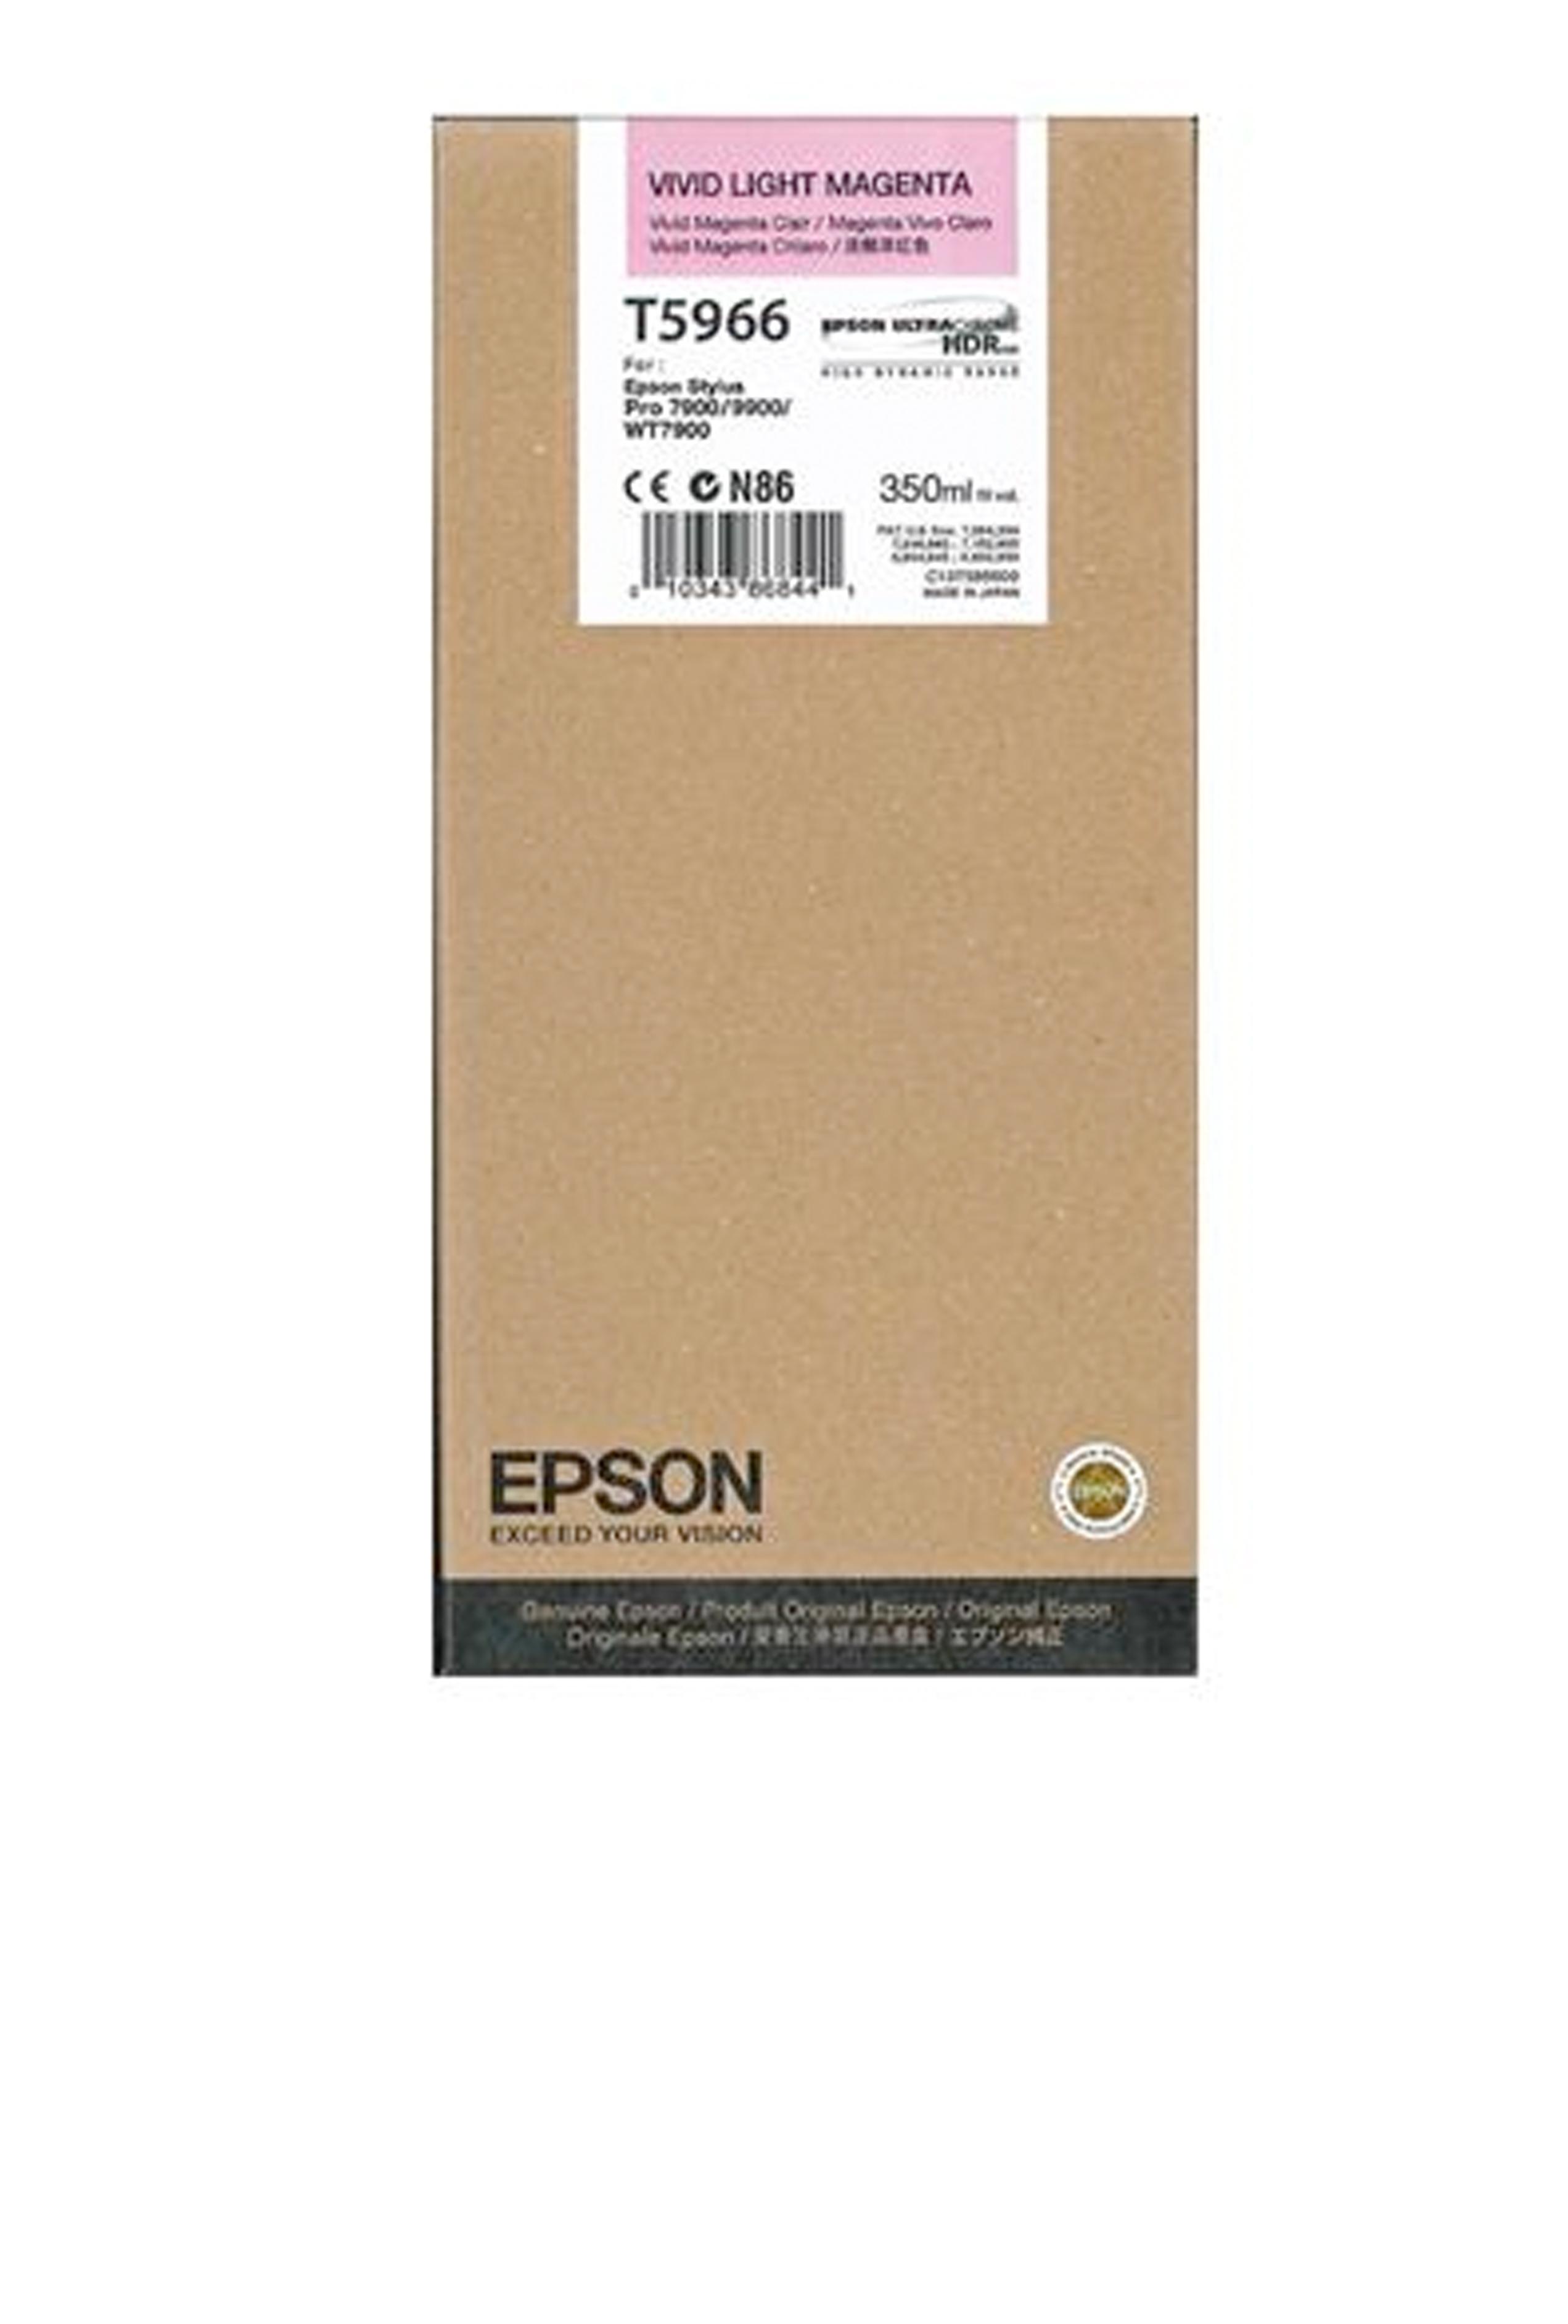 Epson EPSON SD VIVID LT MAGENTA (350 ML) (T596600)